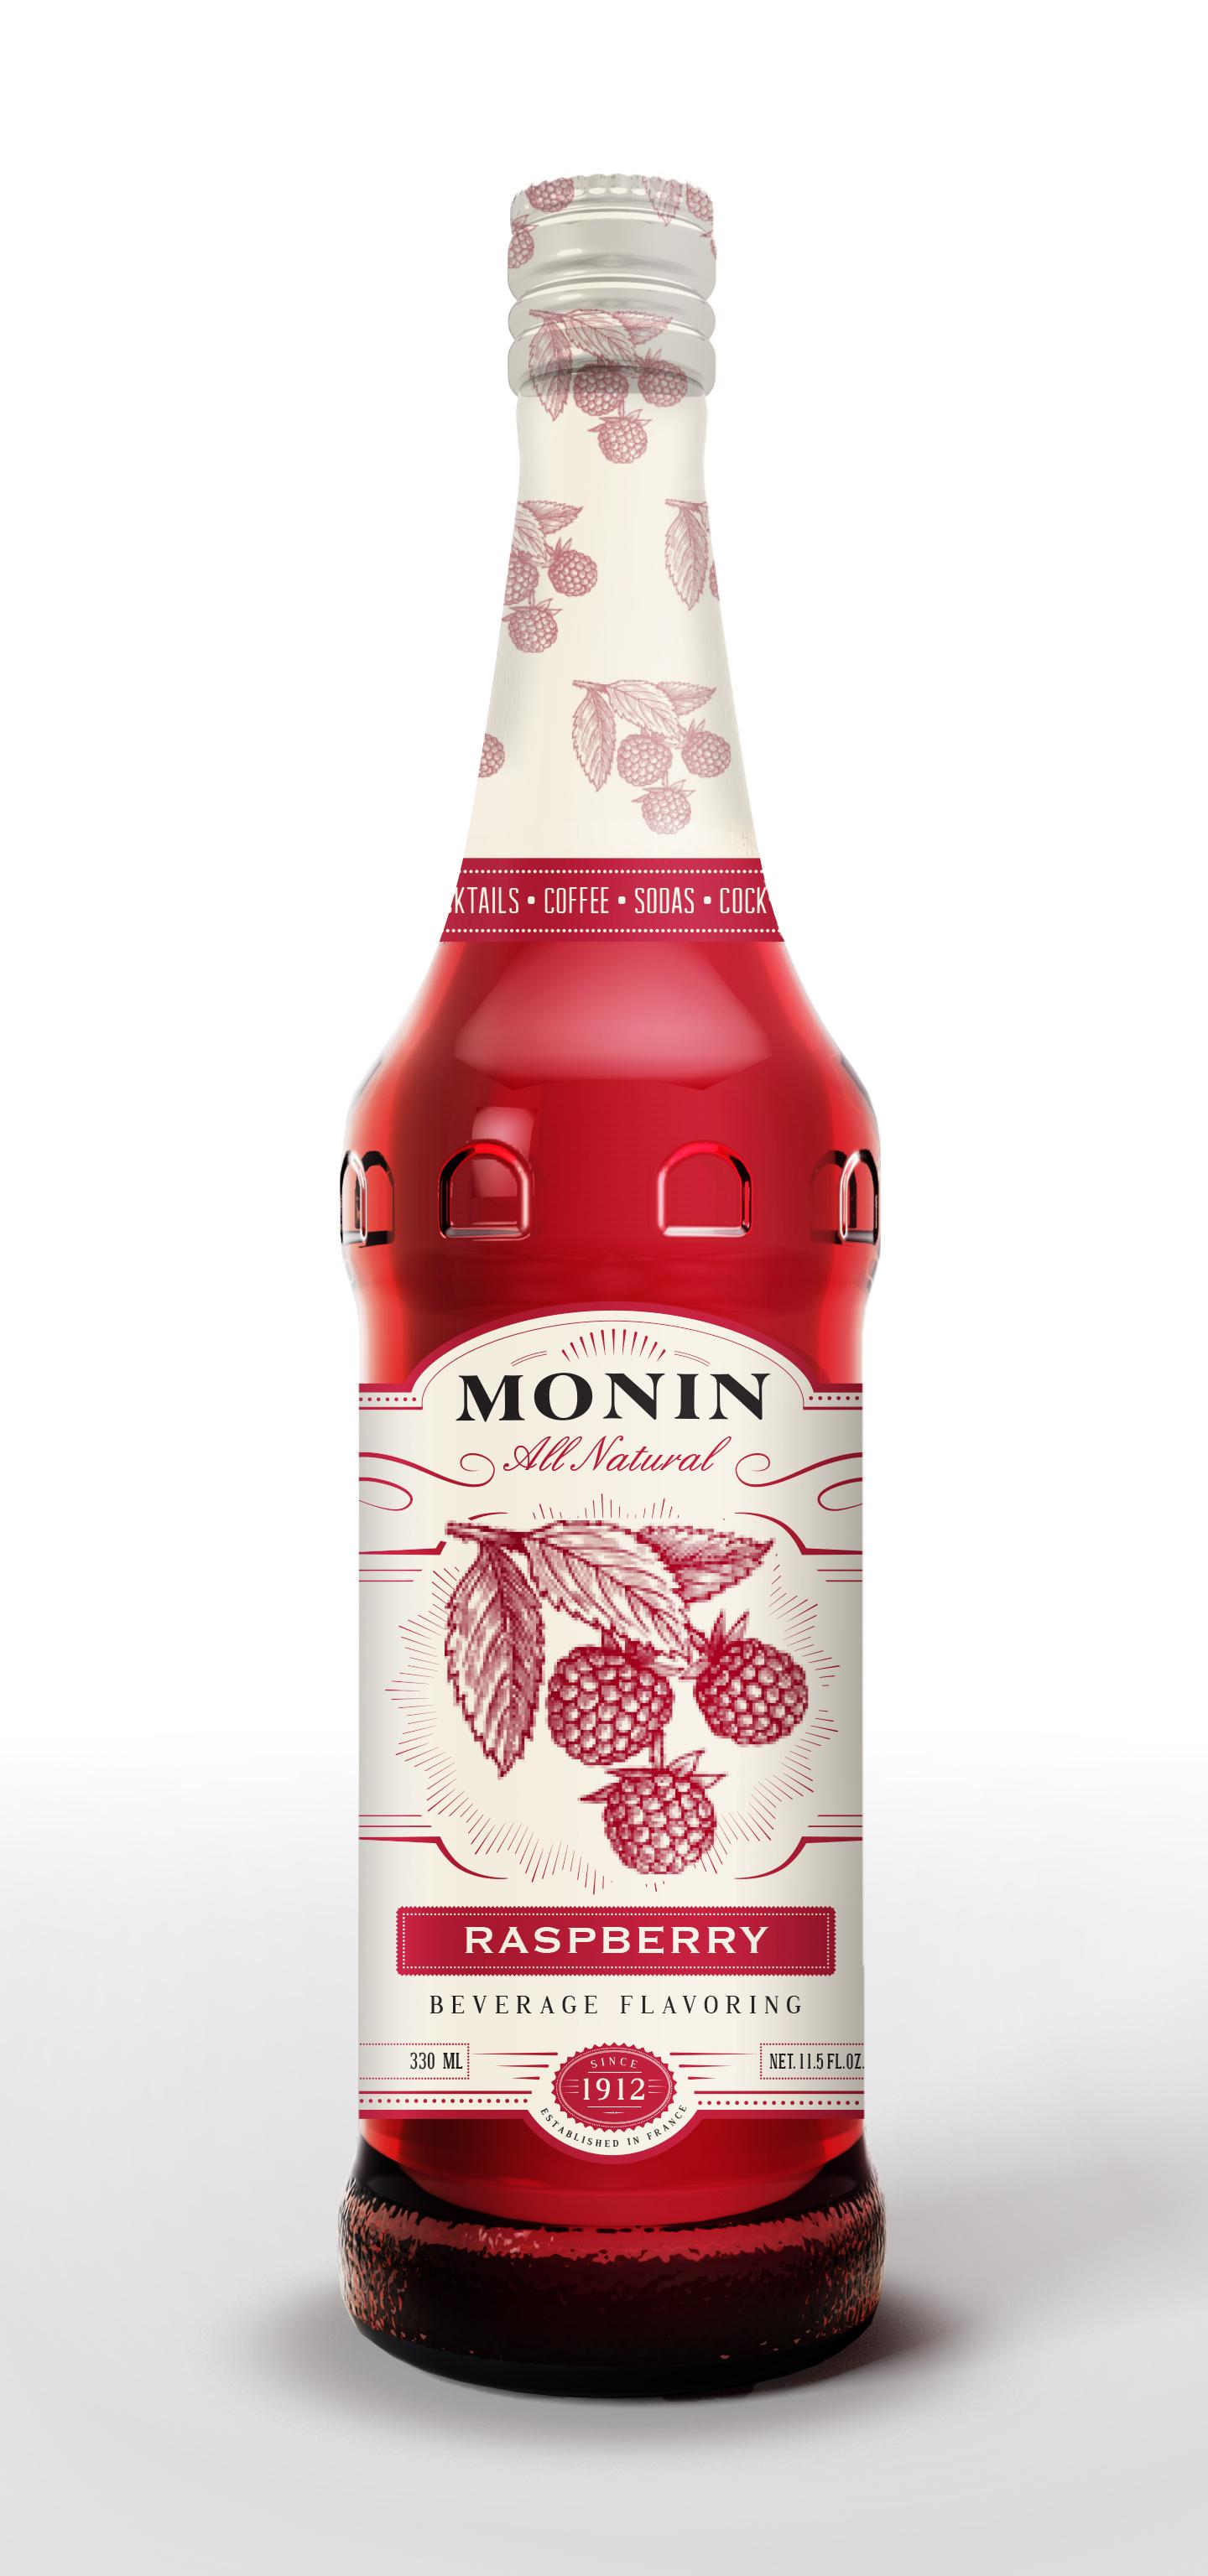 Monin_Bottle_Mockup_Raps4.jpg